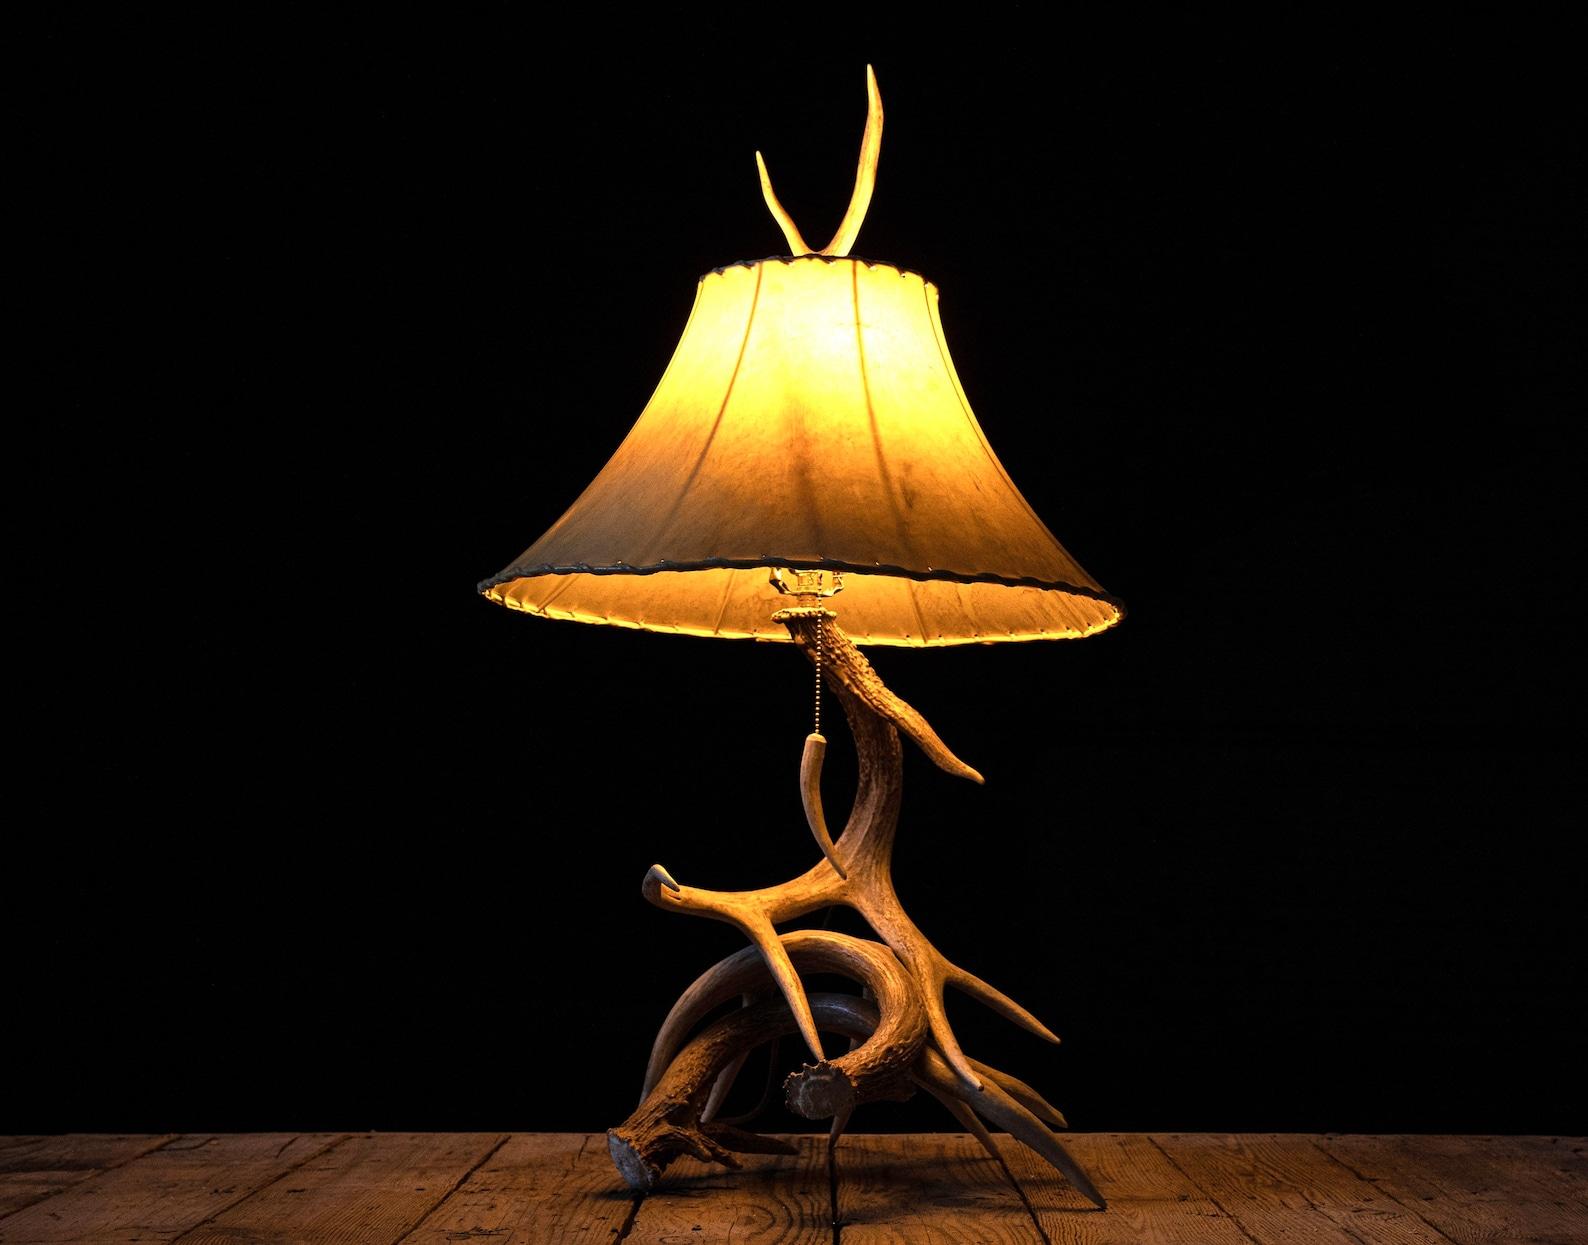 Trophy Whitetail Deer 3-4 Antler Desk Lamp Rustic Country ...